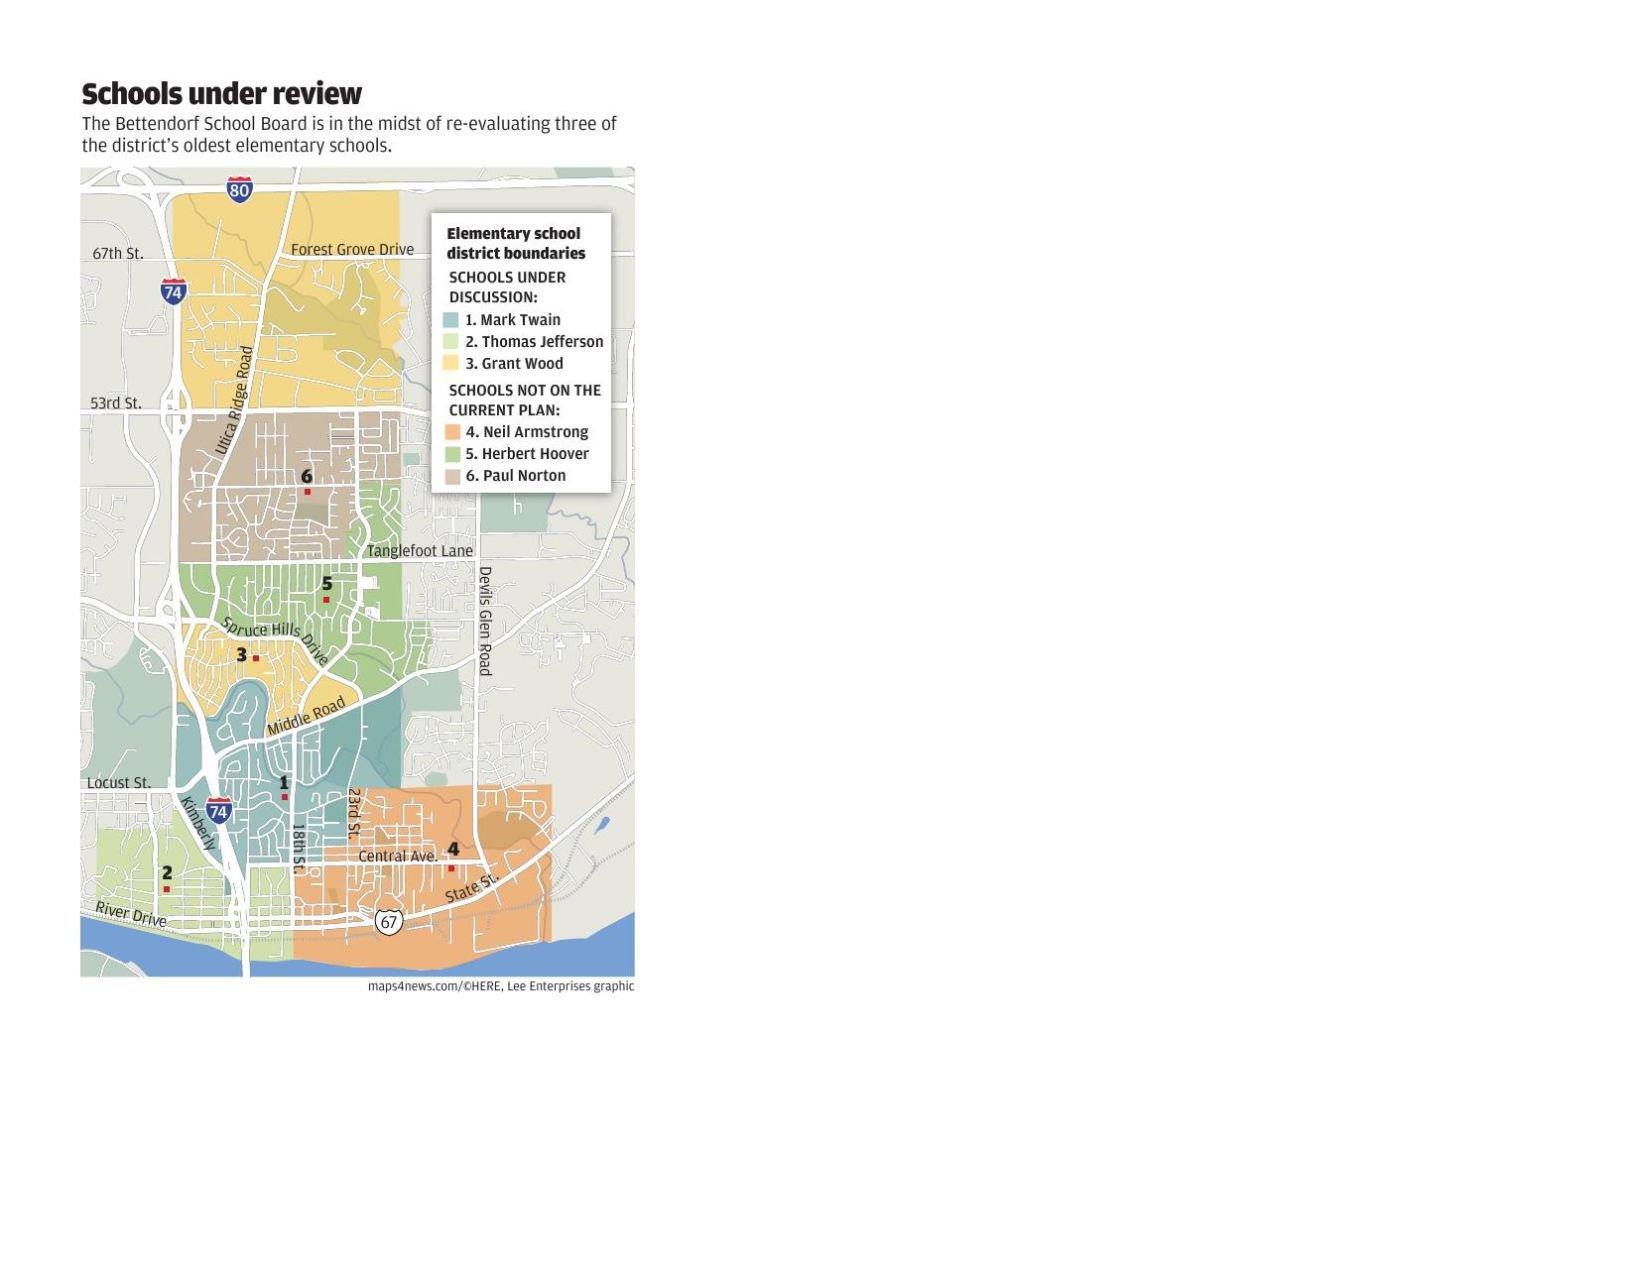 Map of Bettendorf School District qctimescom